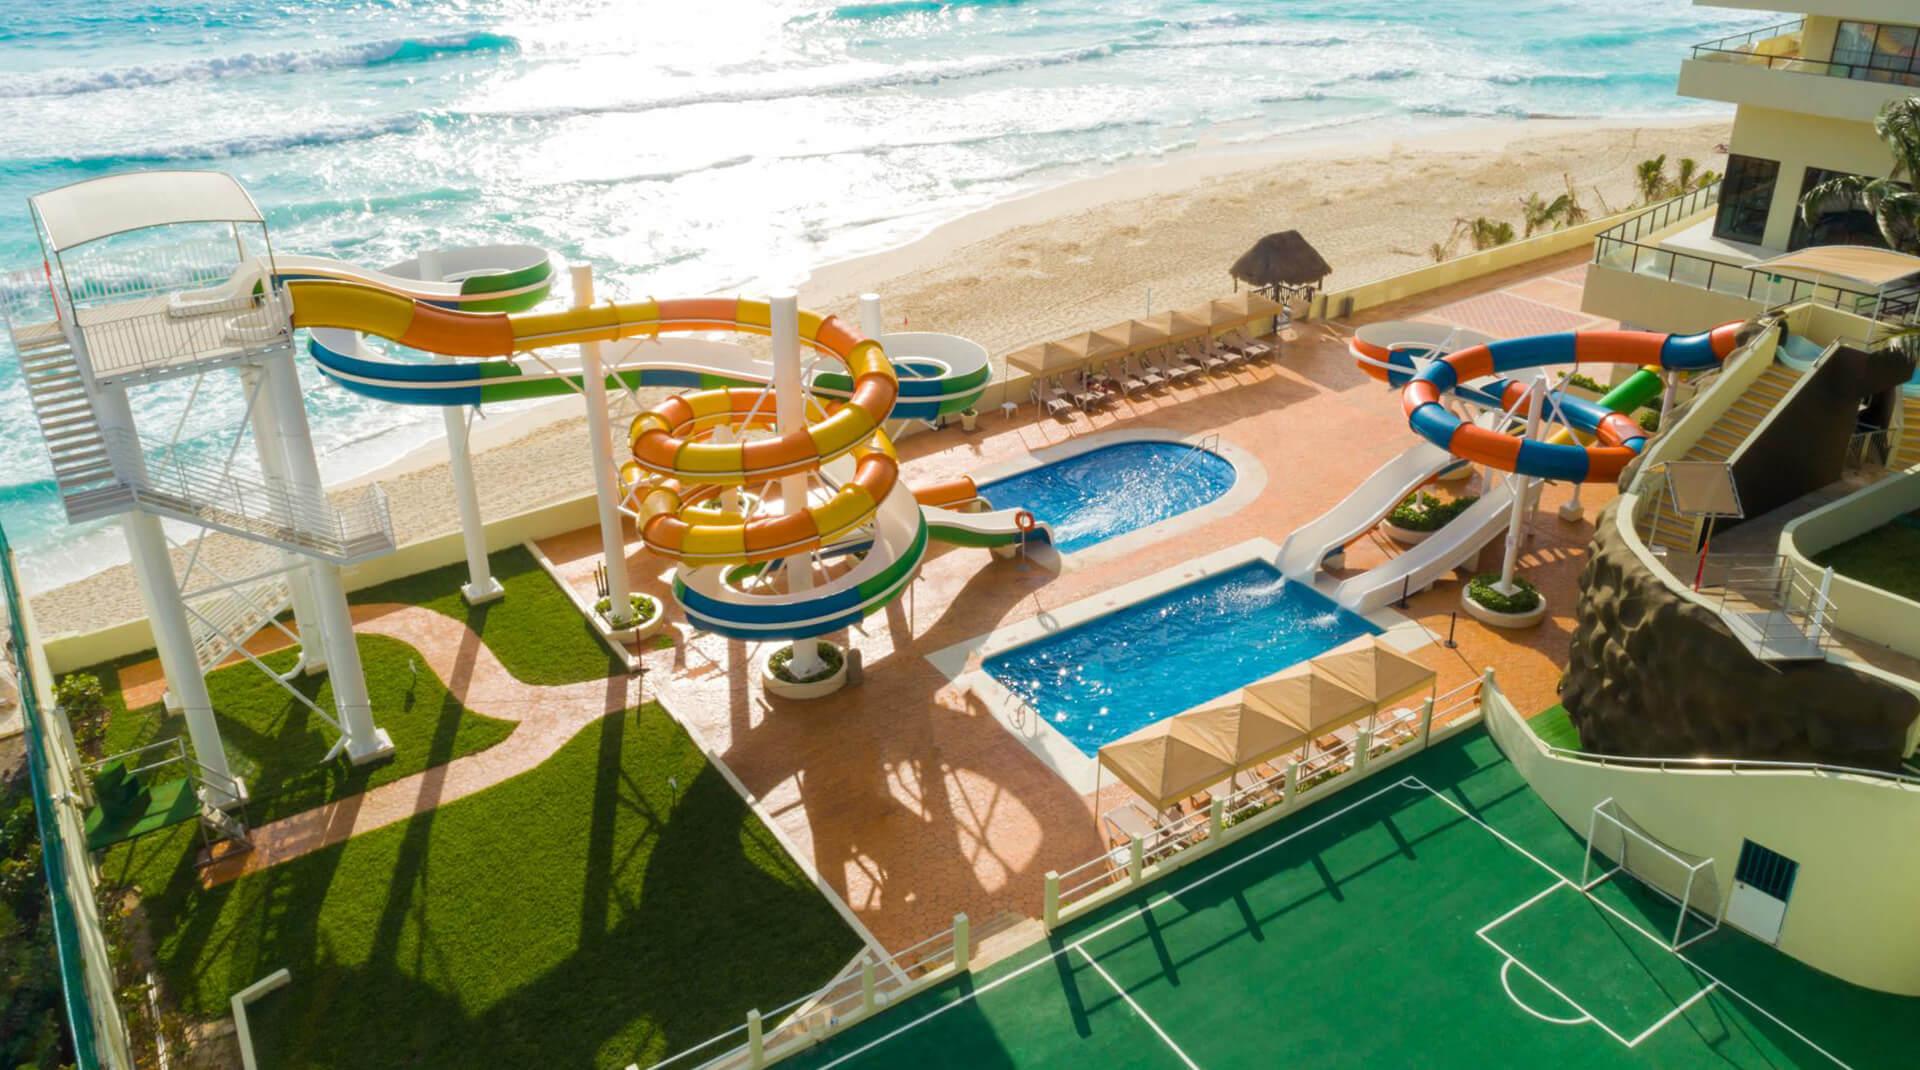 Crown Paradise Club Cancun - all inclusive hotels cancun mexico